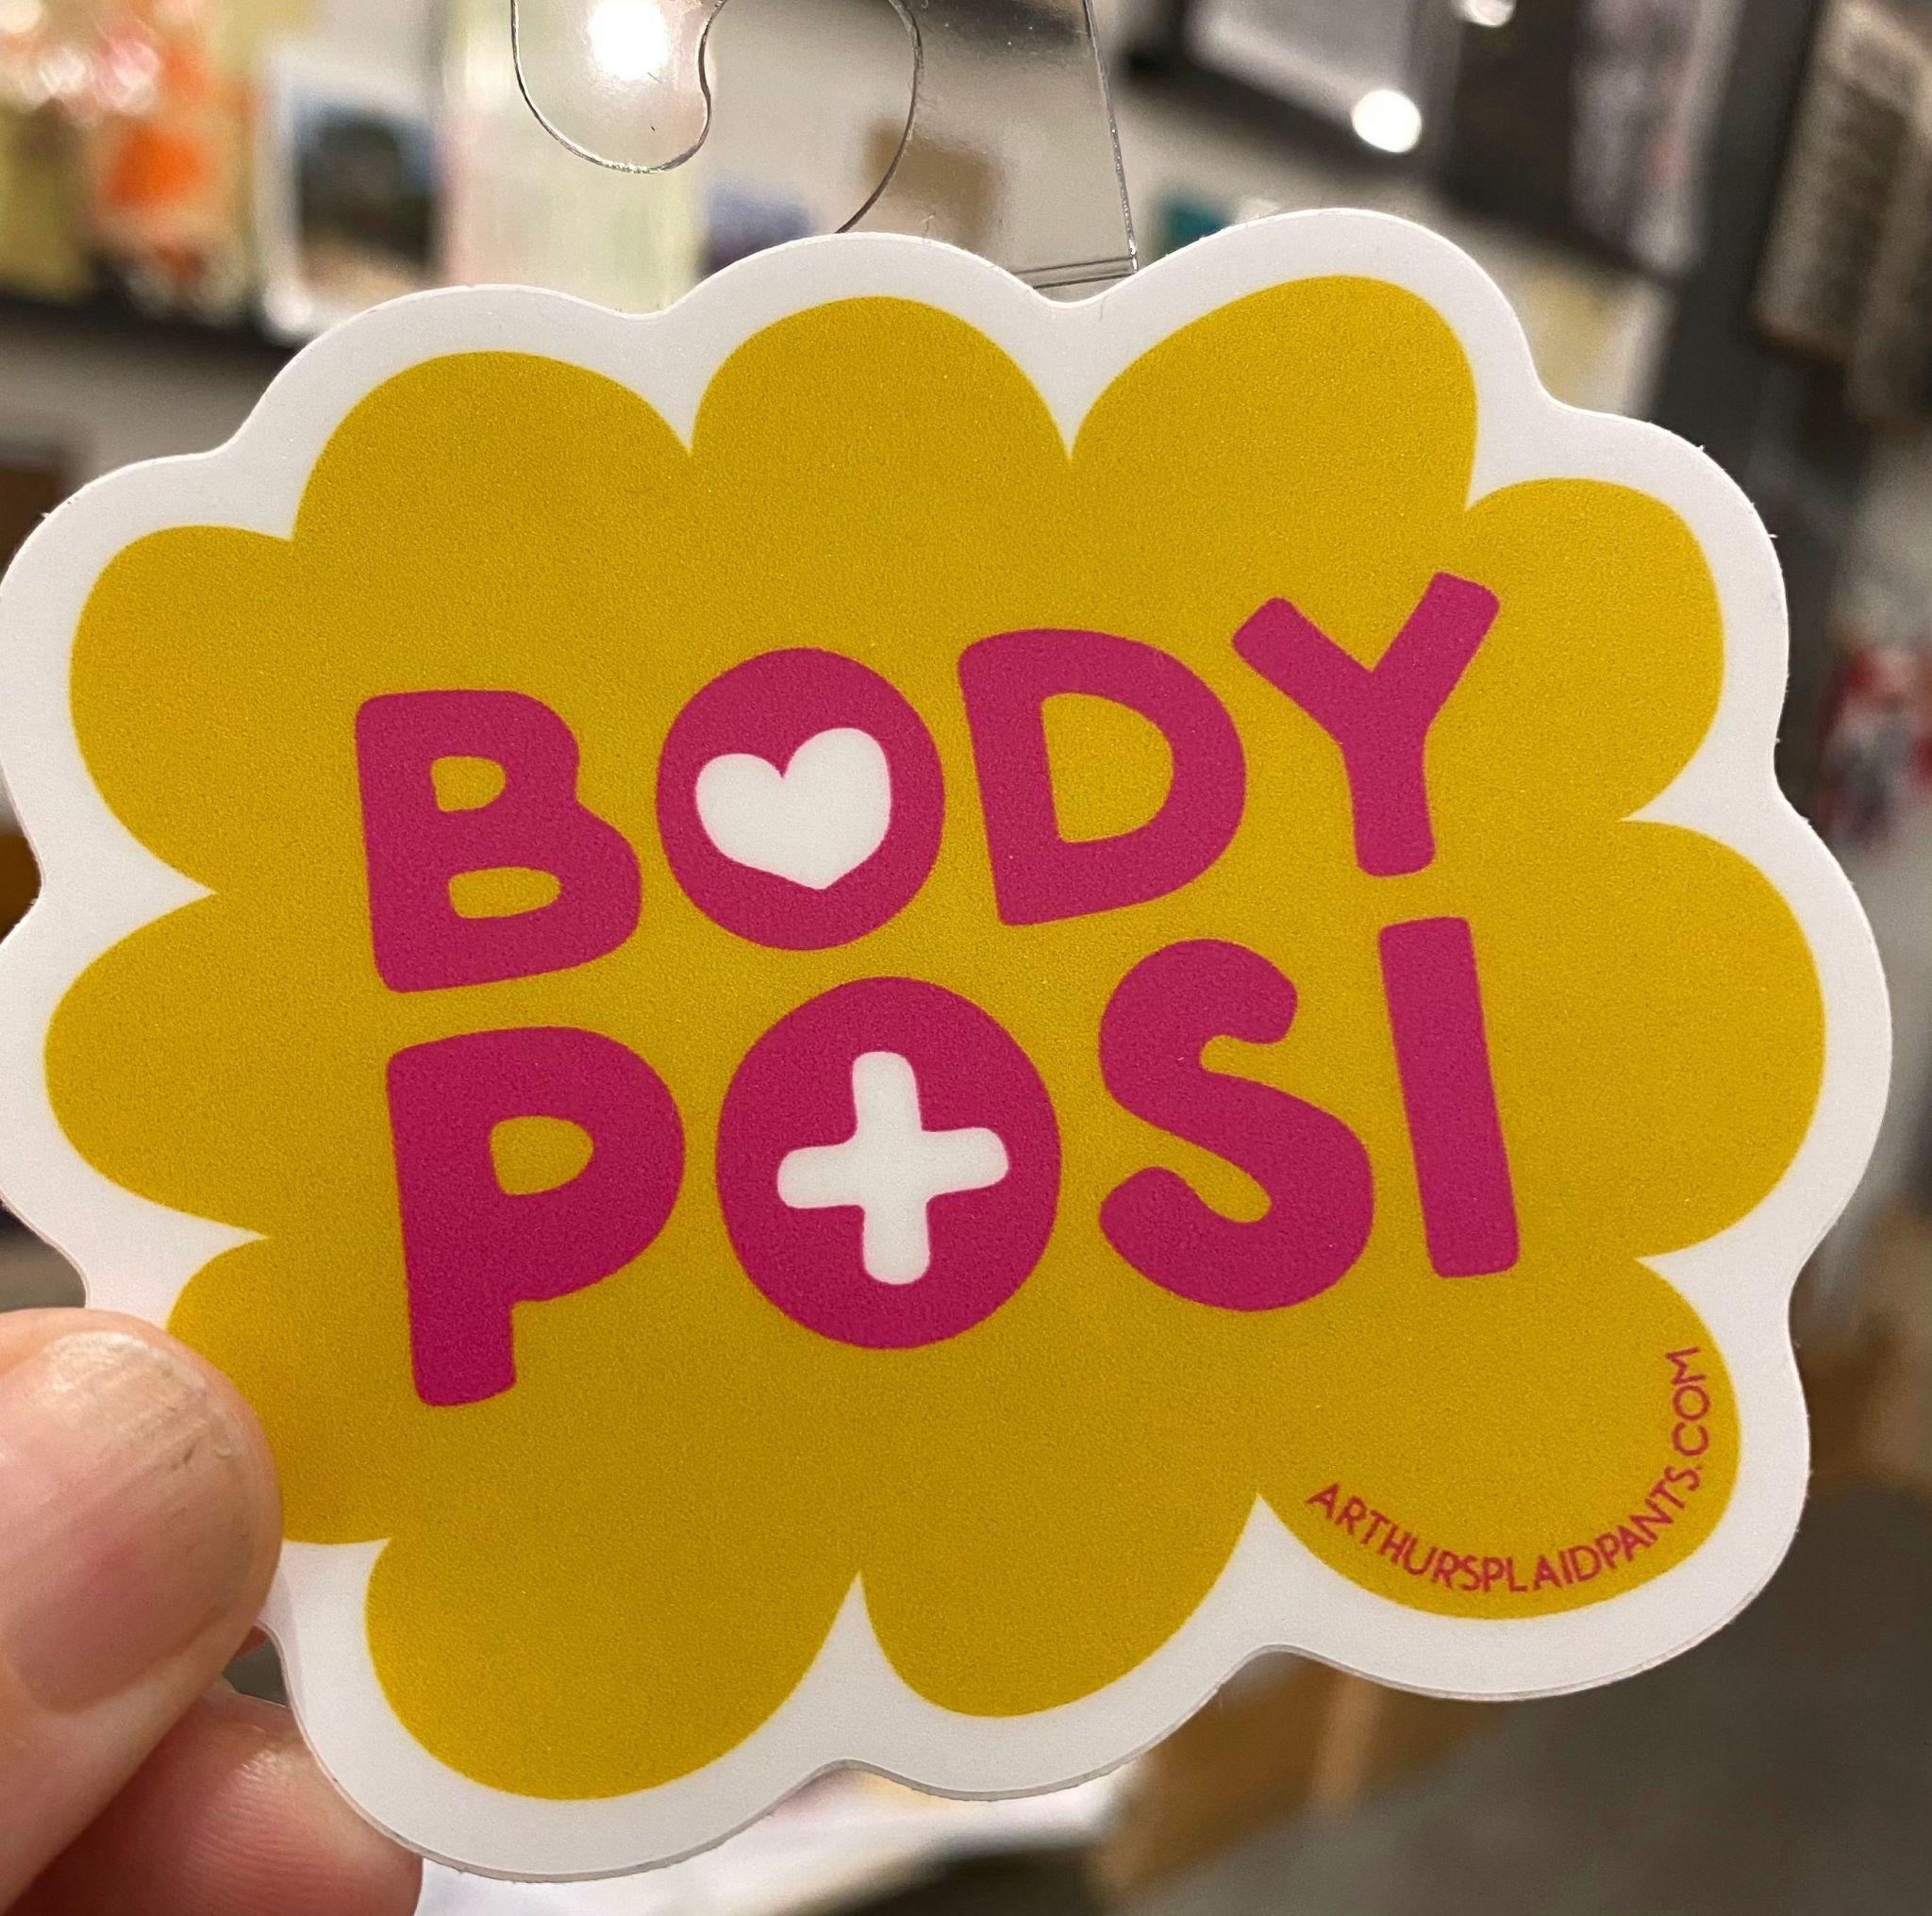 Arthur's Plaid Pants Body Posi Sticker